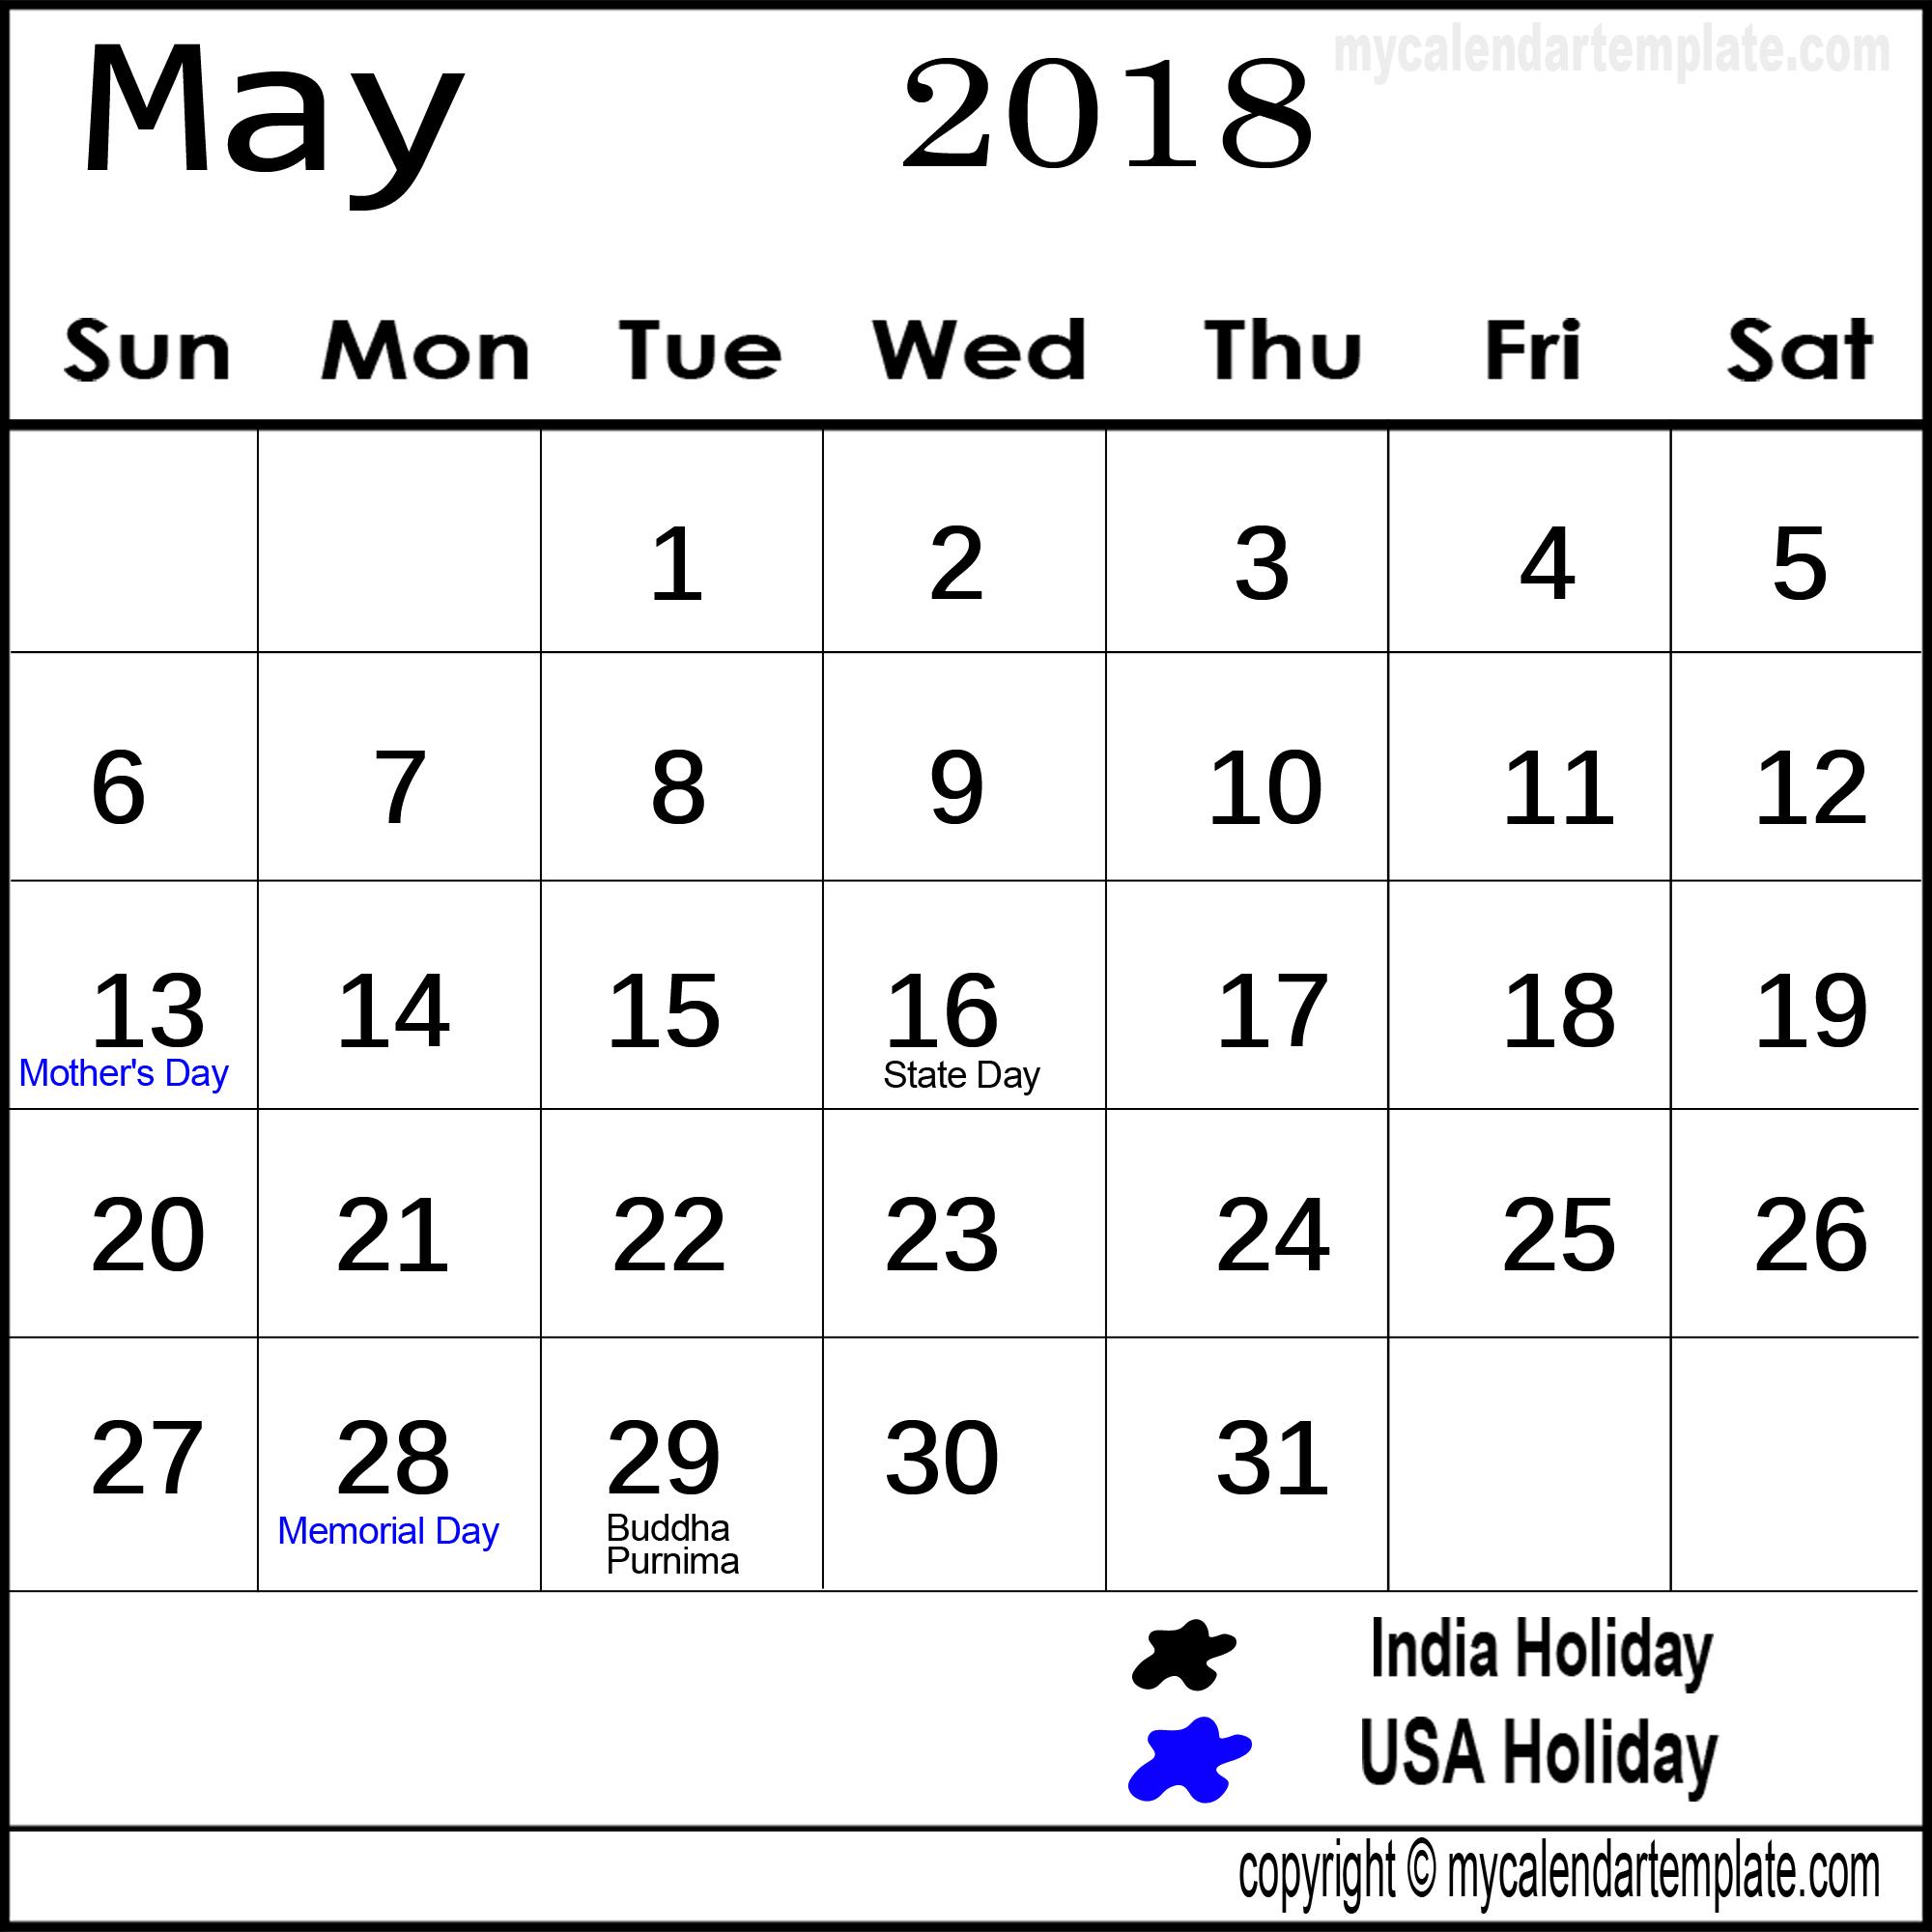 May 2018 India Calendar with Holidays